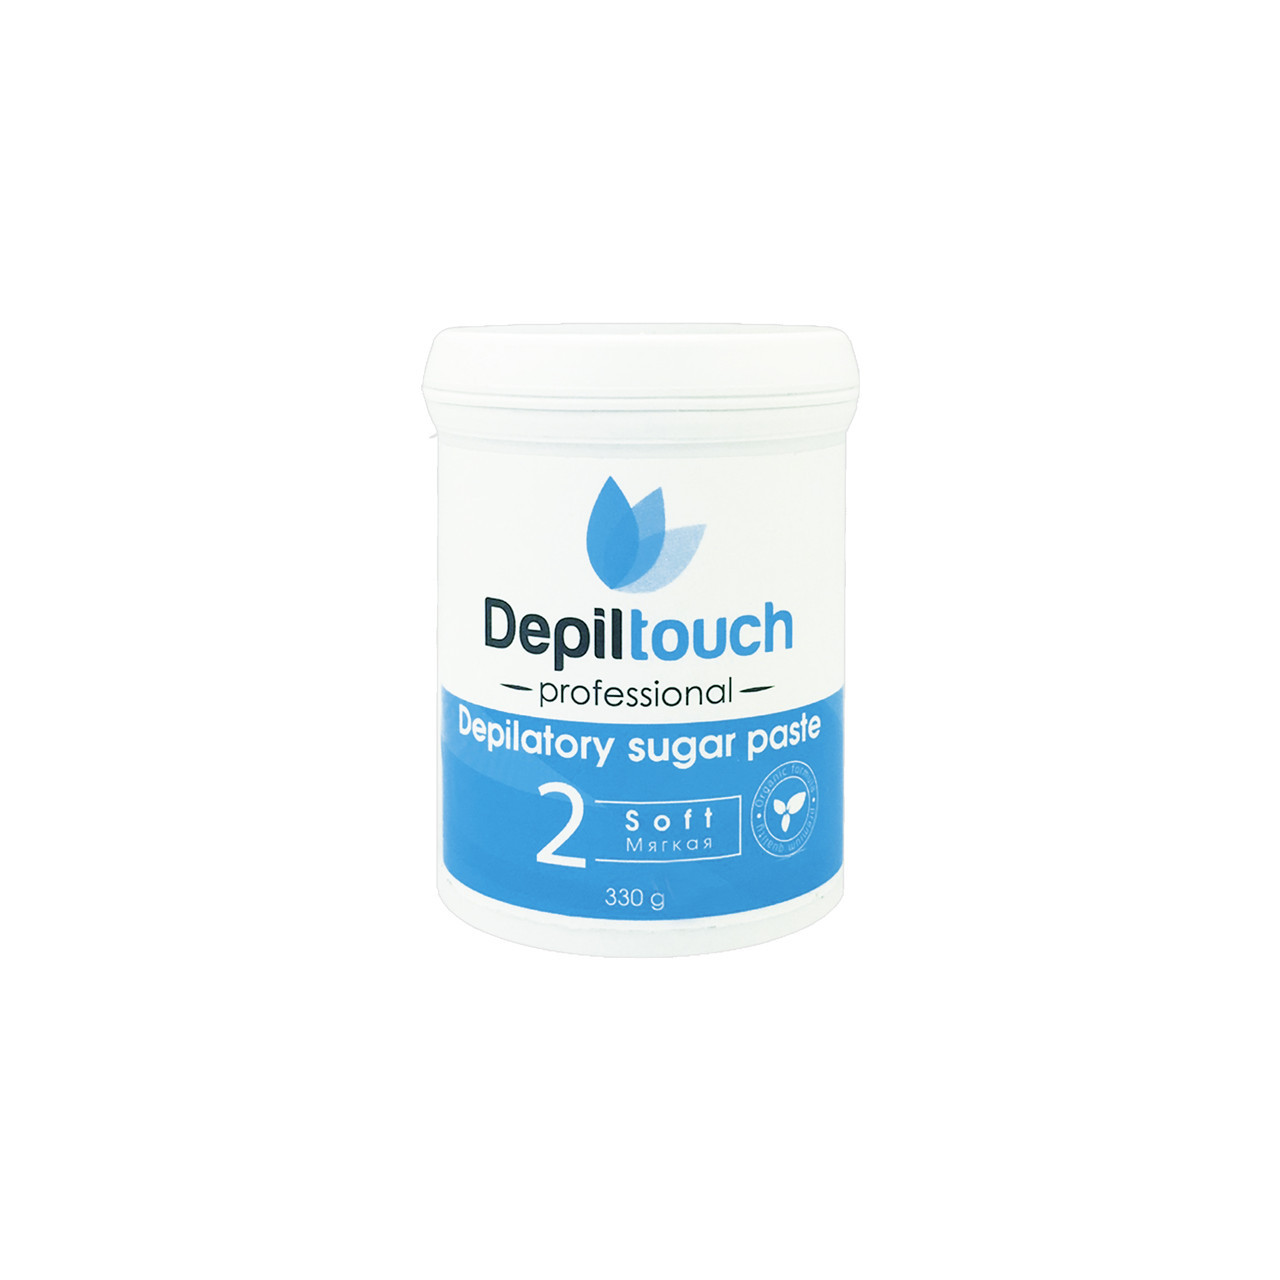 Сахарная паста для депиляции мягкая Depiltouch Professional 330g